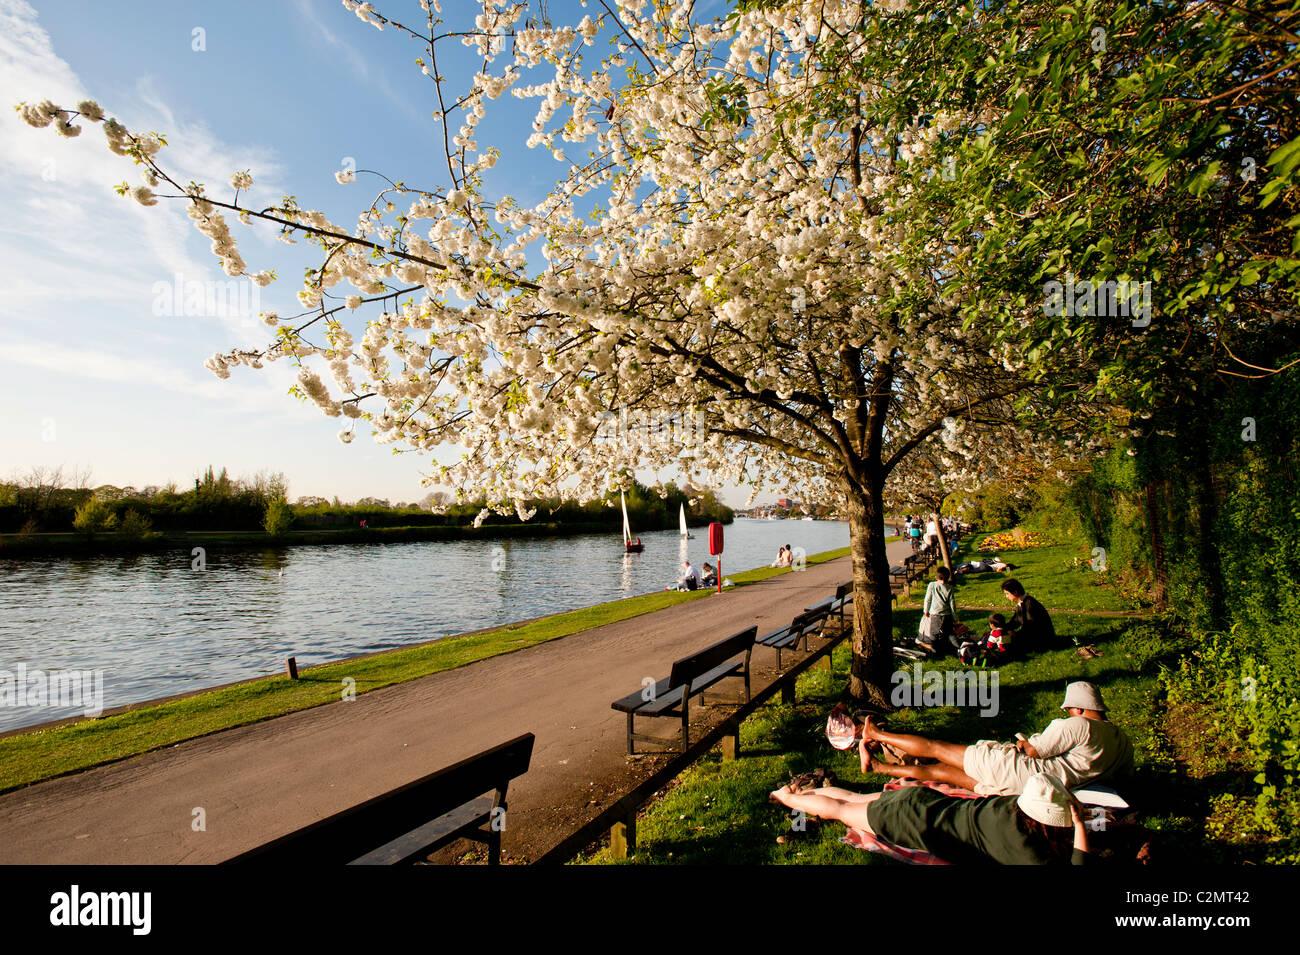 Royal Borough Of Kingston Upon Thames Stock Photos & Royal Borough ...